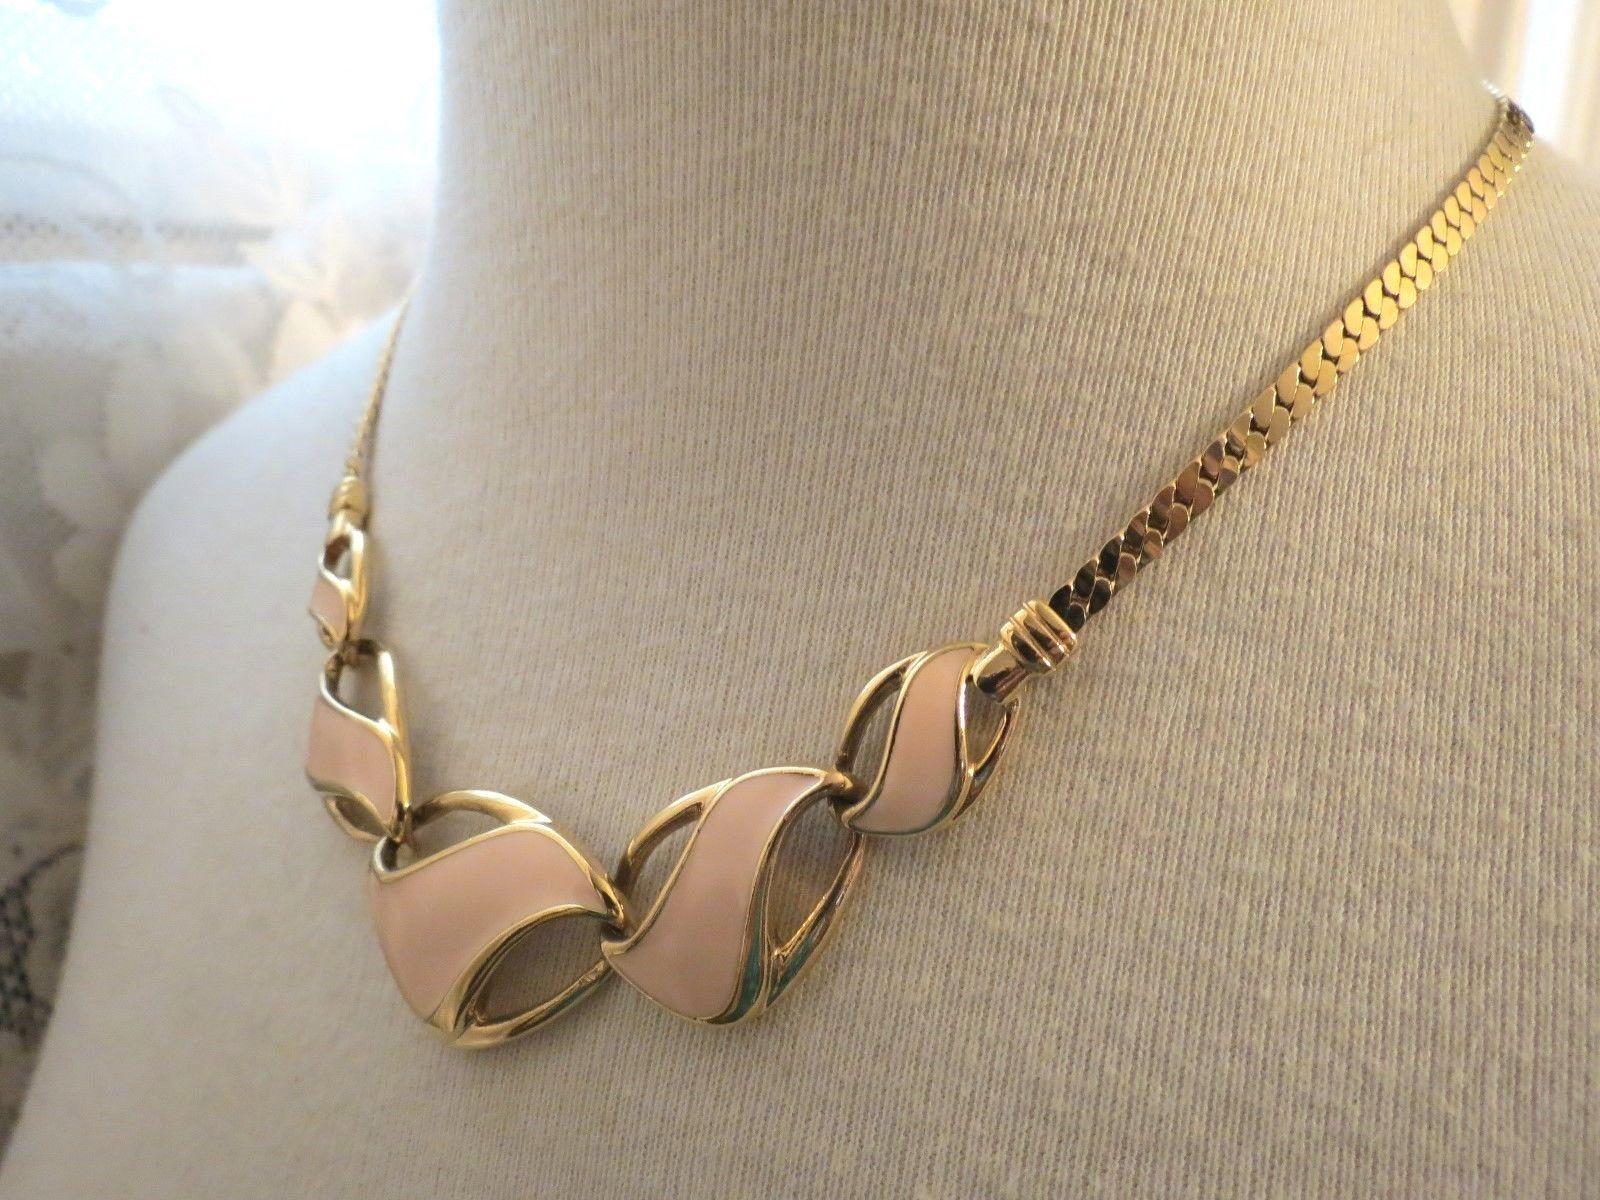 "Trifari Enamel Necklace Bib Pendant Chain Gold Plated Peach Pink 17"" Collar NICE"